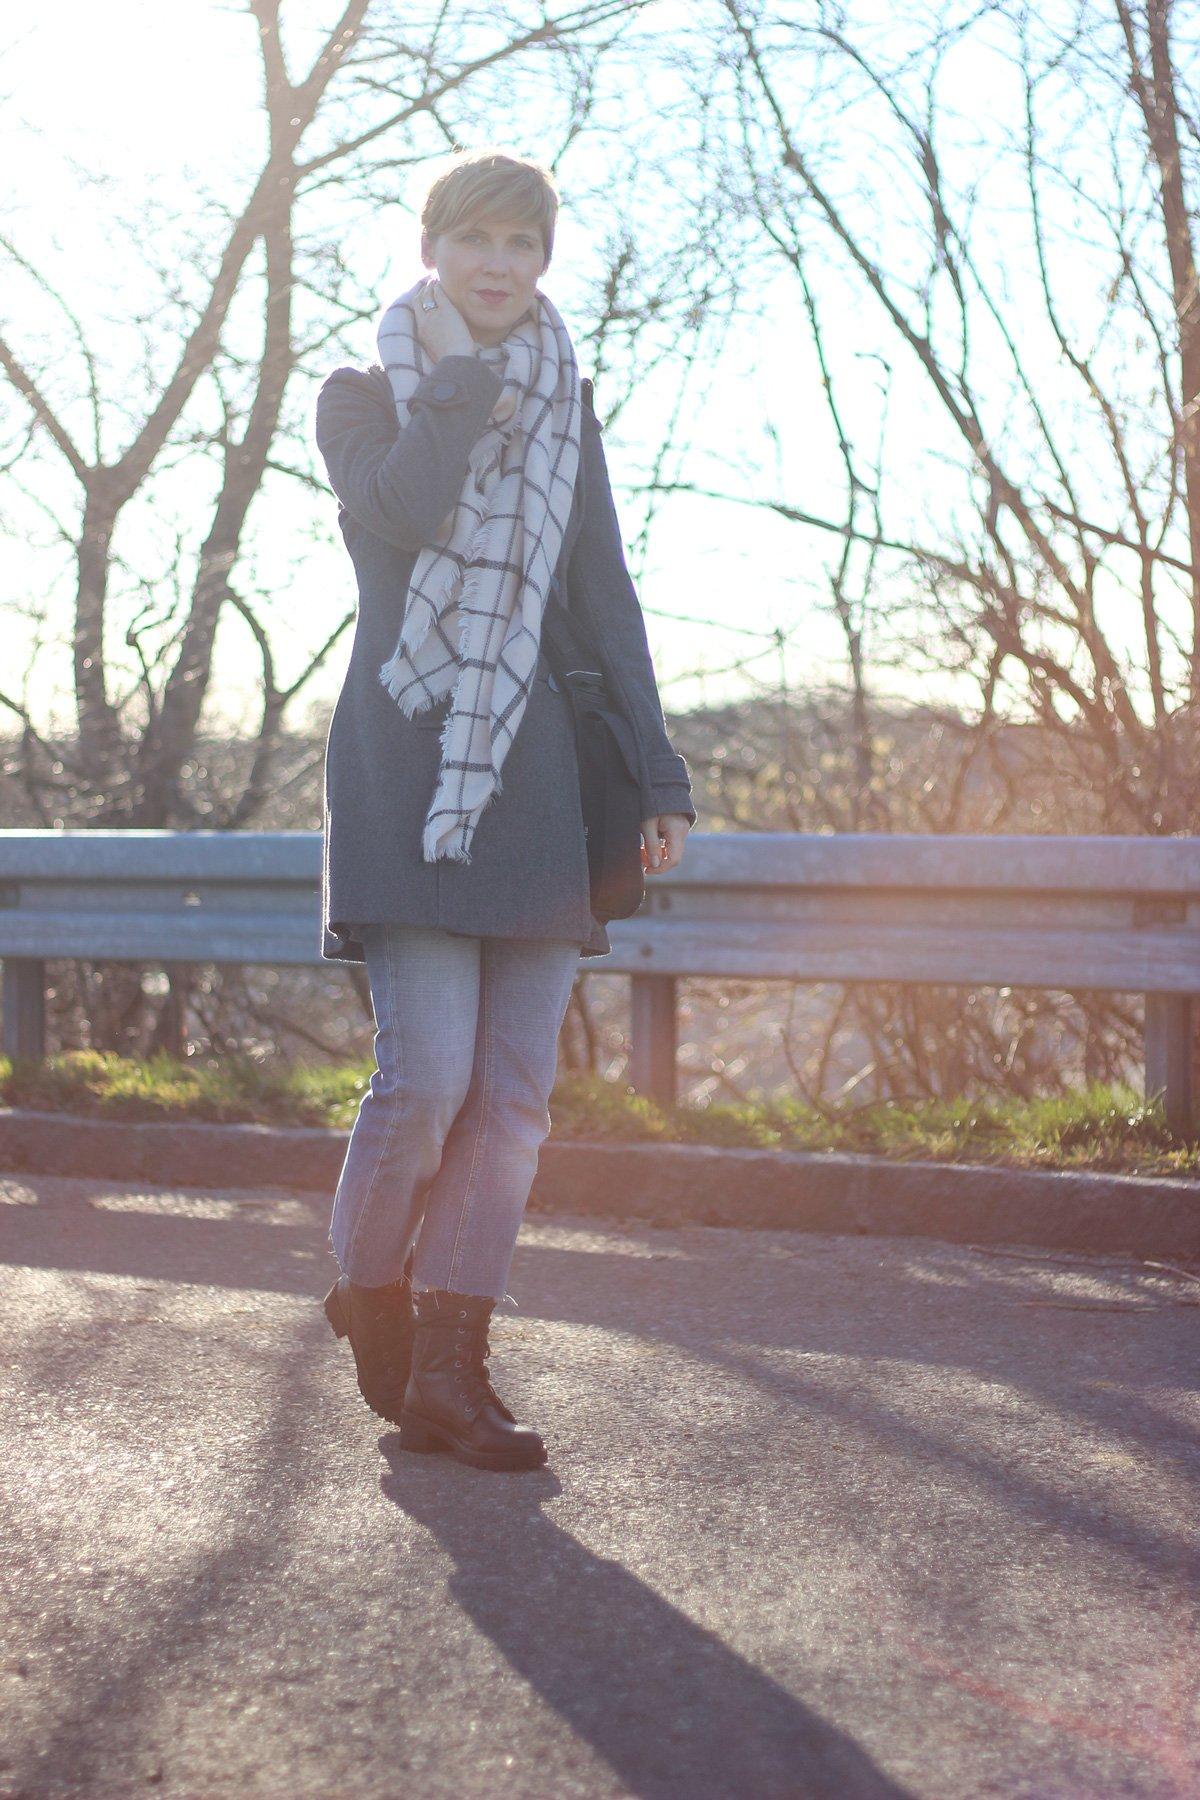 Schal, Mantel, DIY-Jeans, Grau und Blau